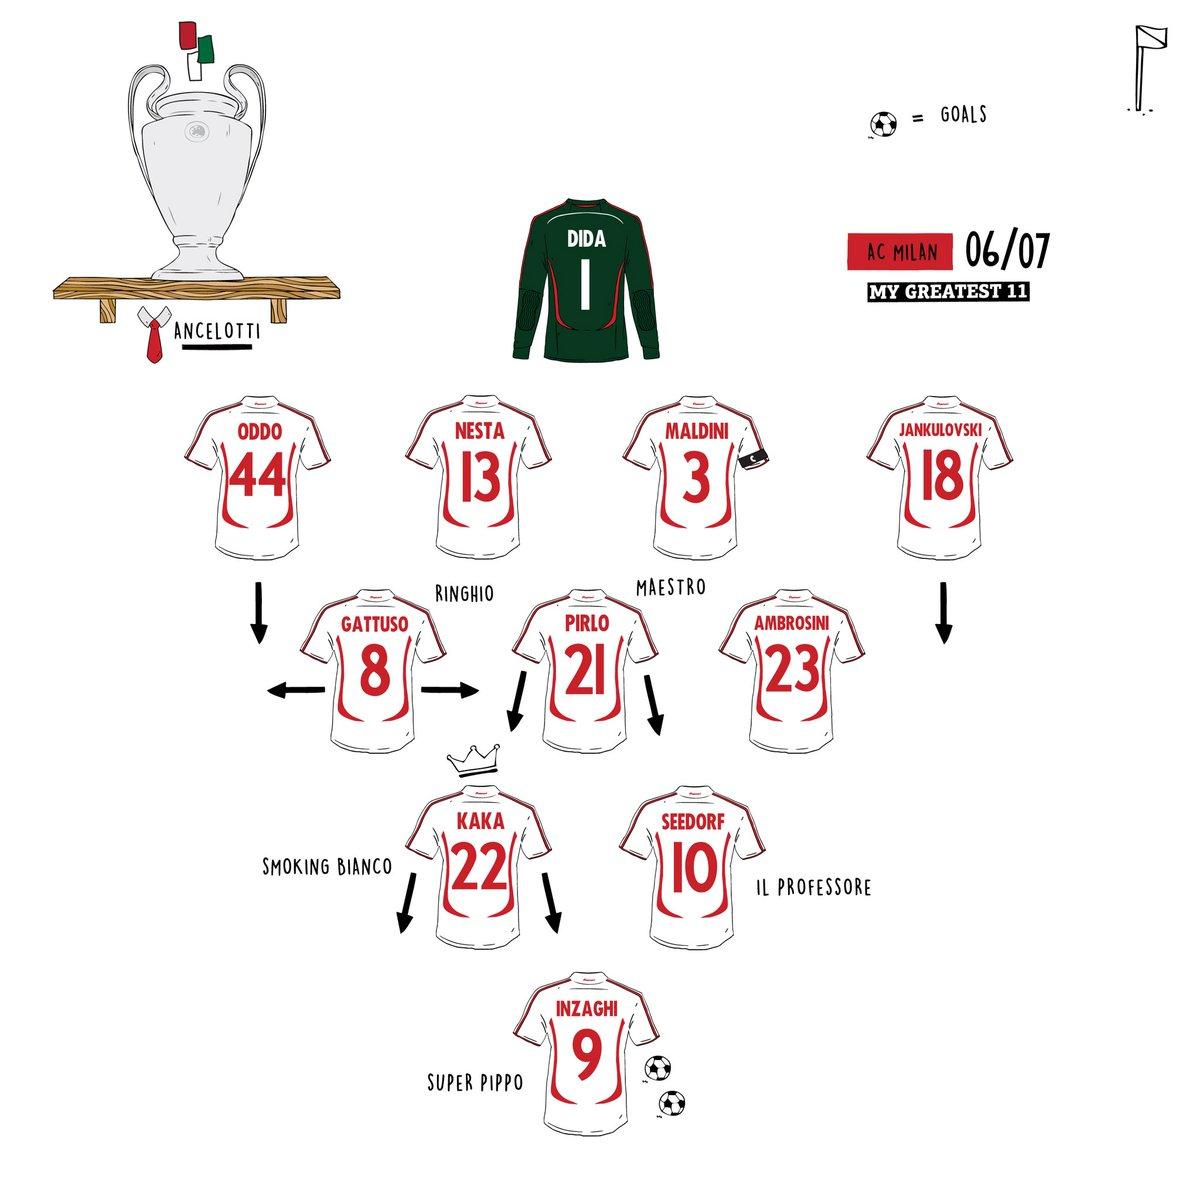 23/05/07 - UCL Final  AC Milan 2-1 Liverpool https://t.co/95ed5QOm5f